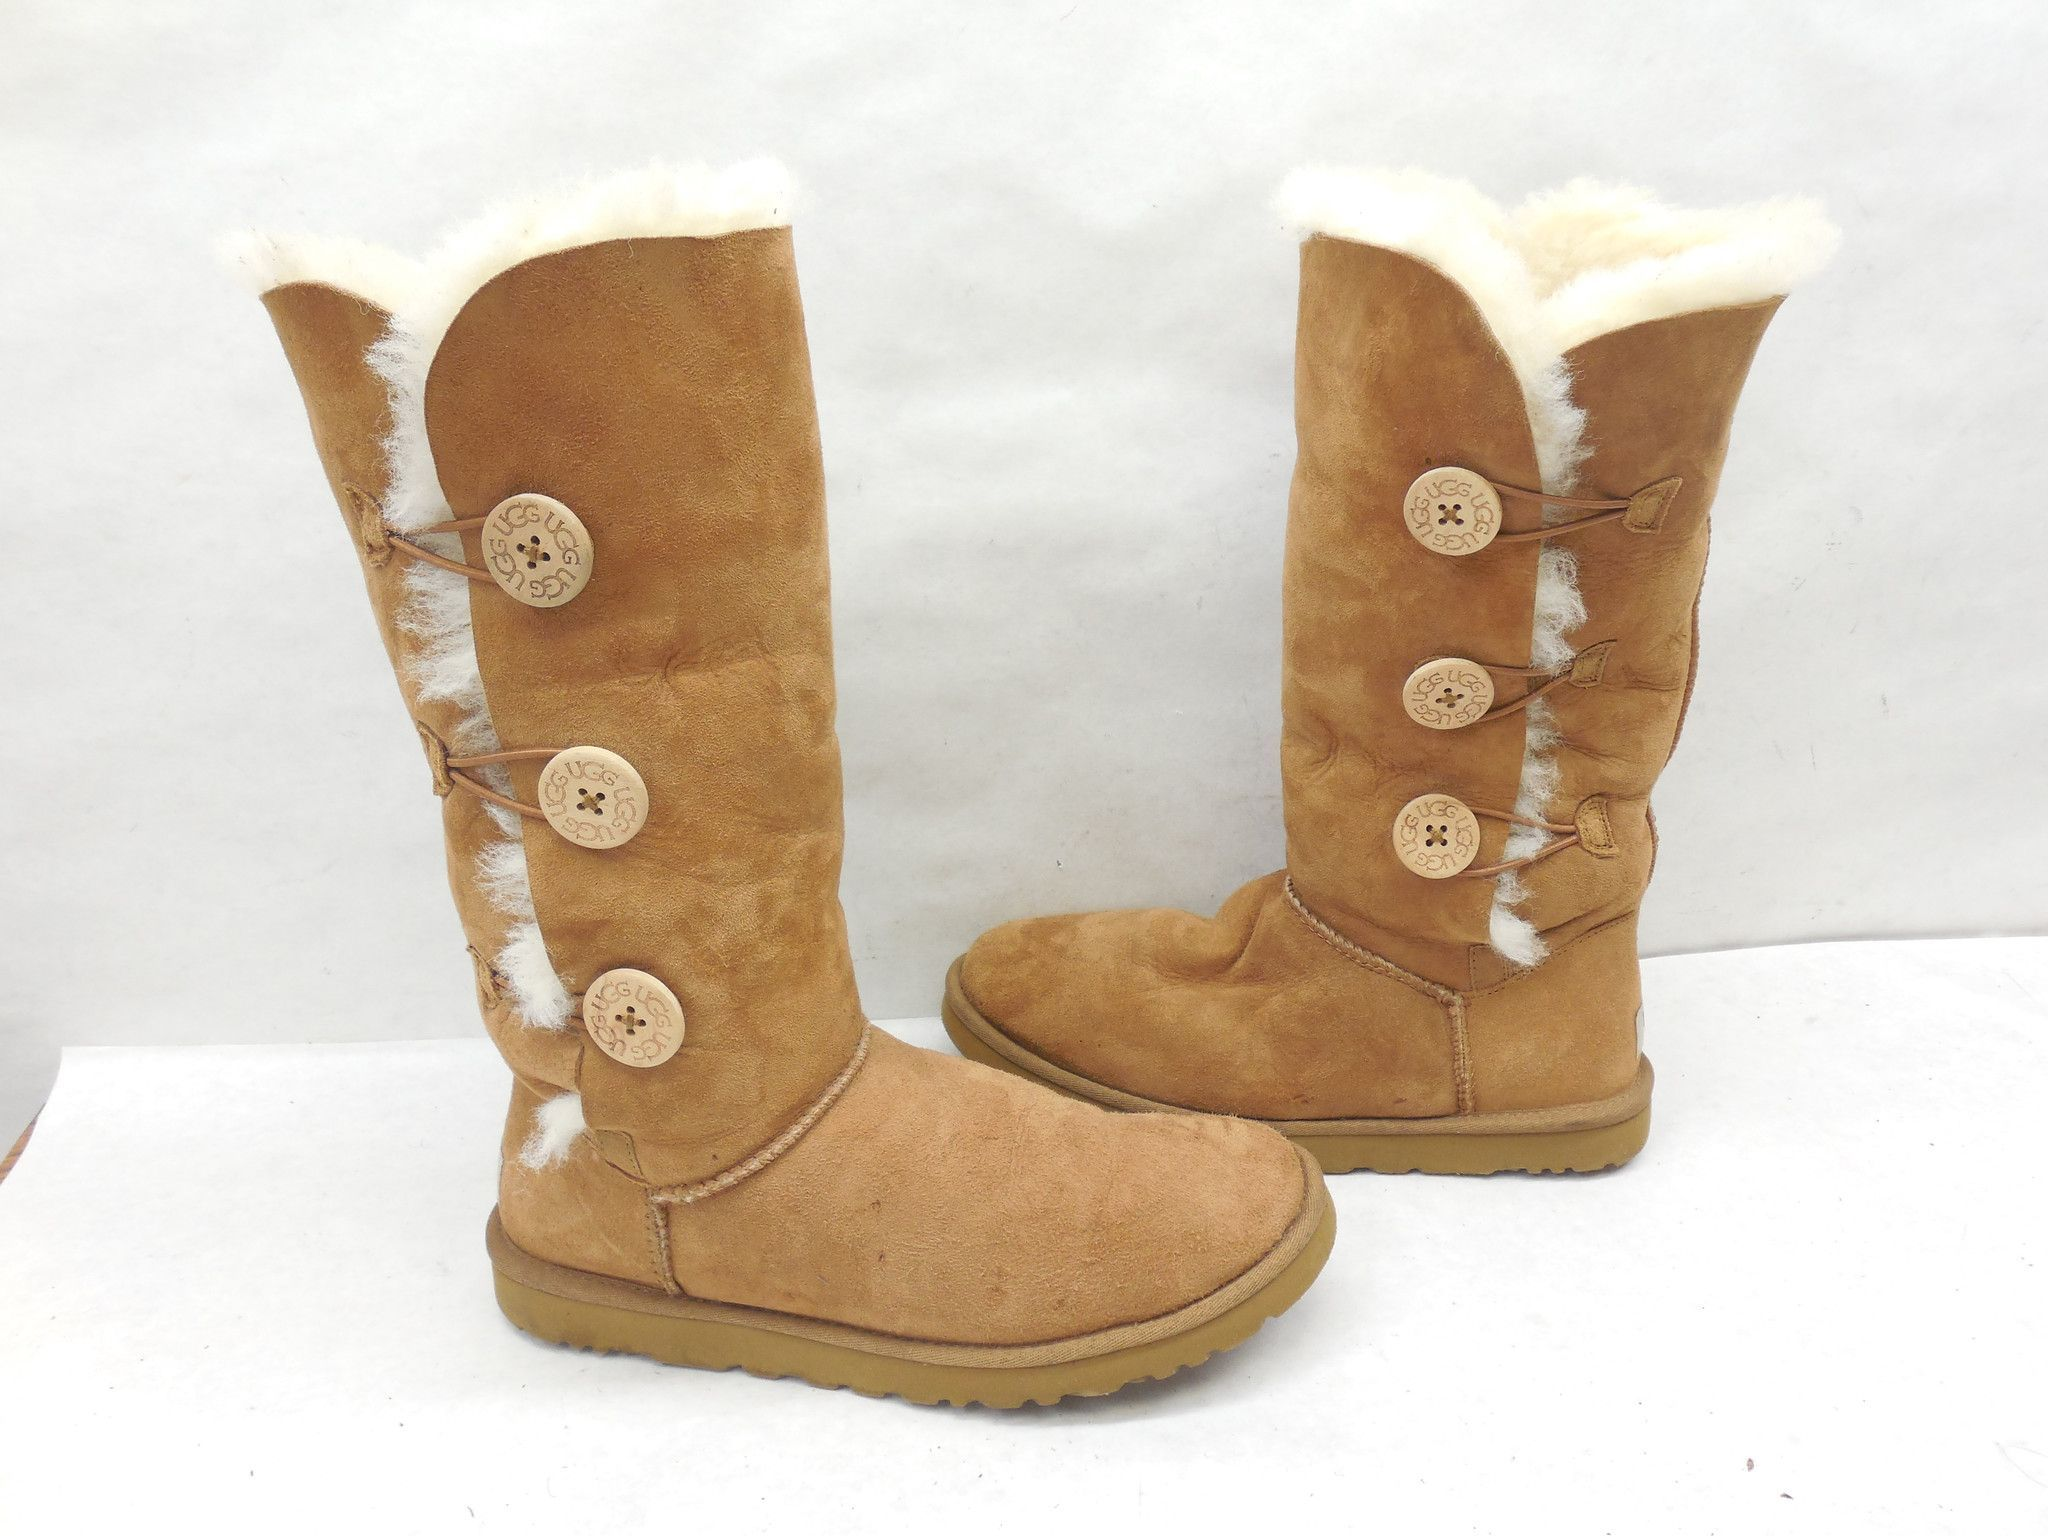 a50049b48e6 New UGG Australia 1873 Chestnut Bailey Button Triplet Boots Size 8 ...